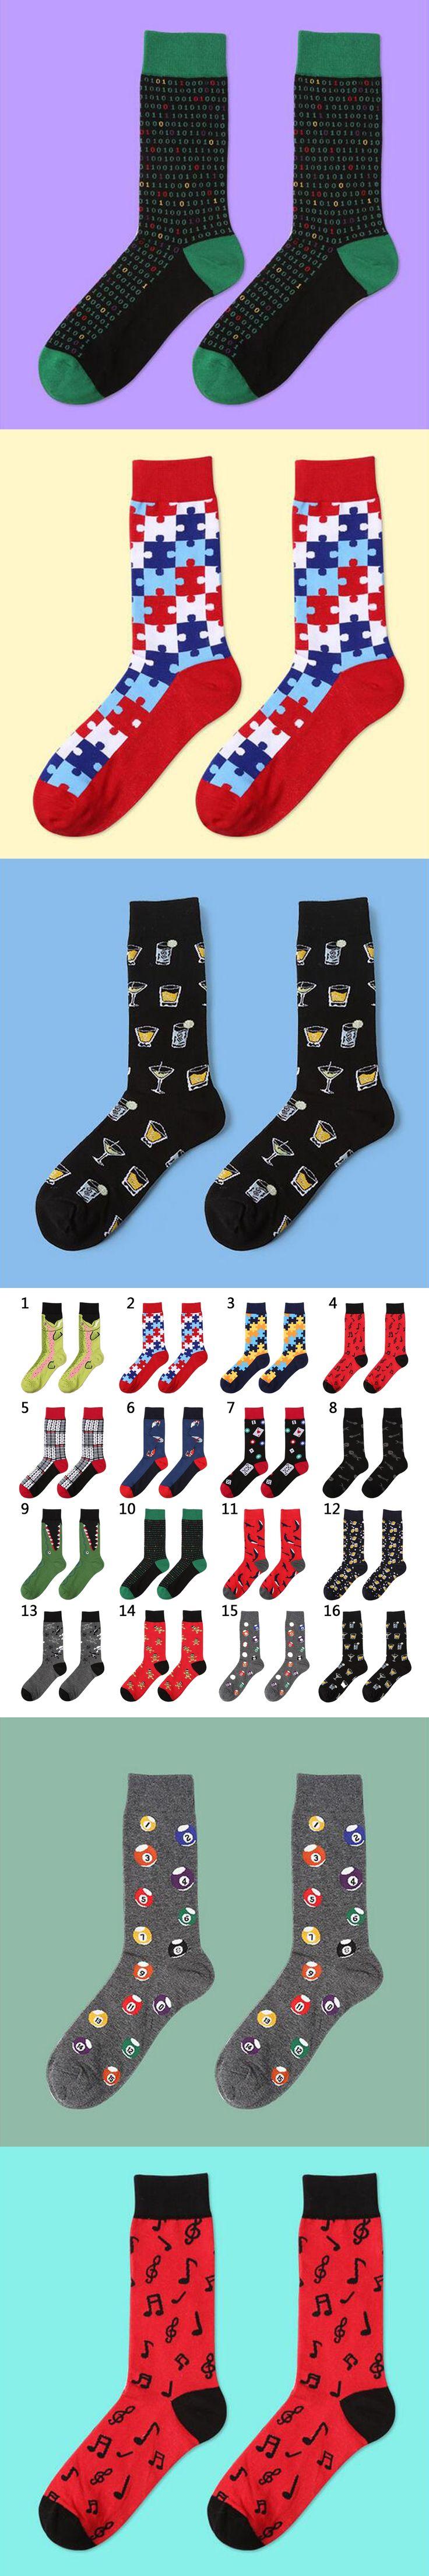 Hot 39-44 Socks Brand Women Men's Novelty Socks Combed Cotton Christmas Gift Chausettes Homme Animal Puzzle Design Funny Socks